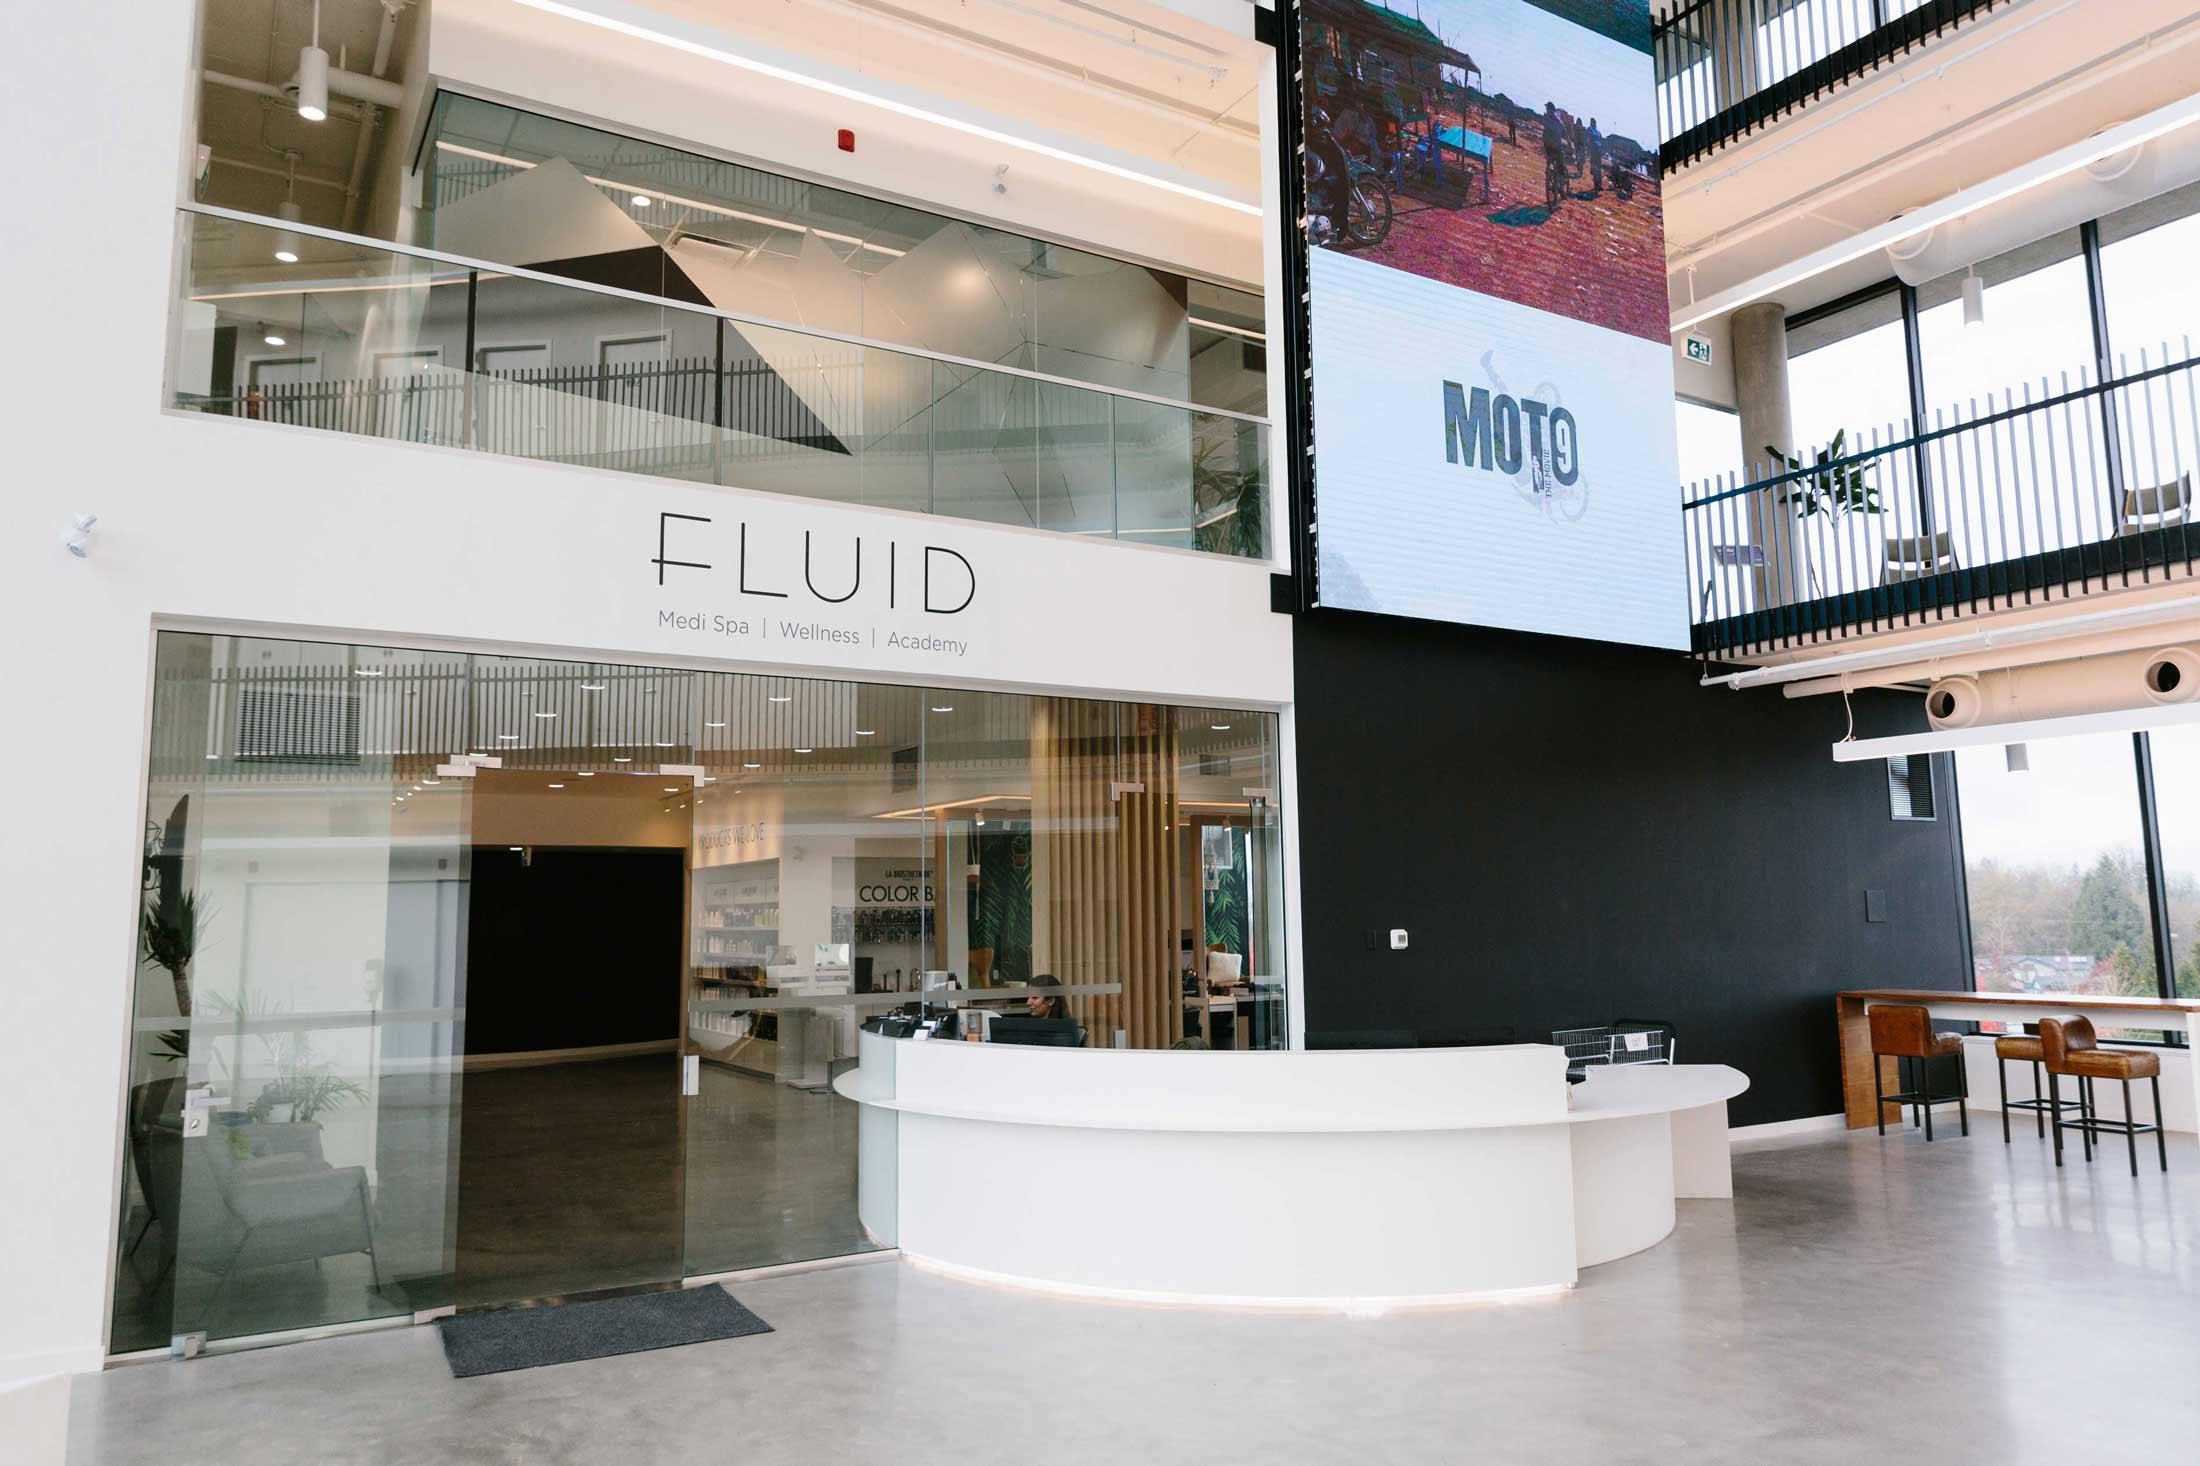 fluid-reception